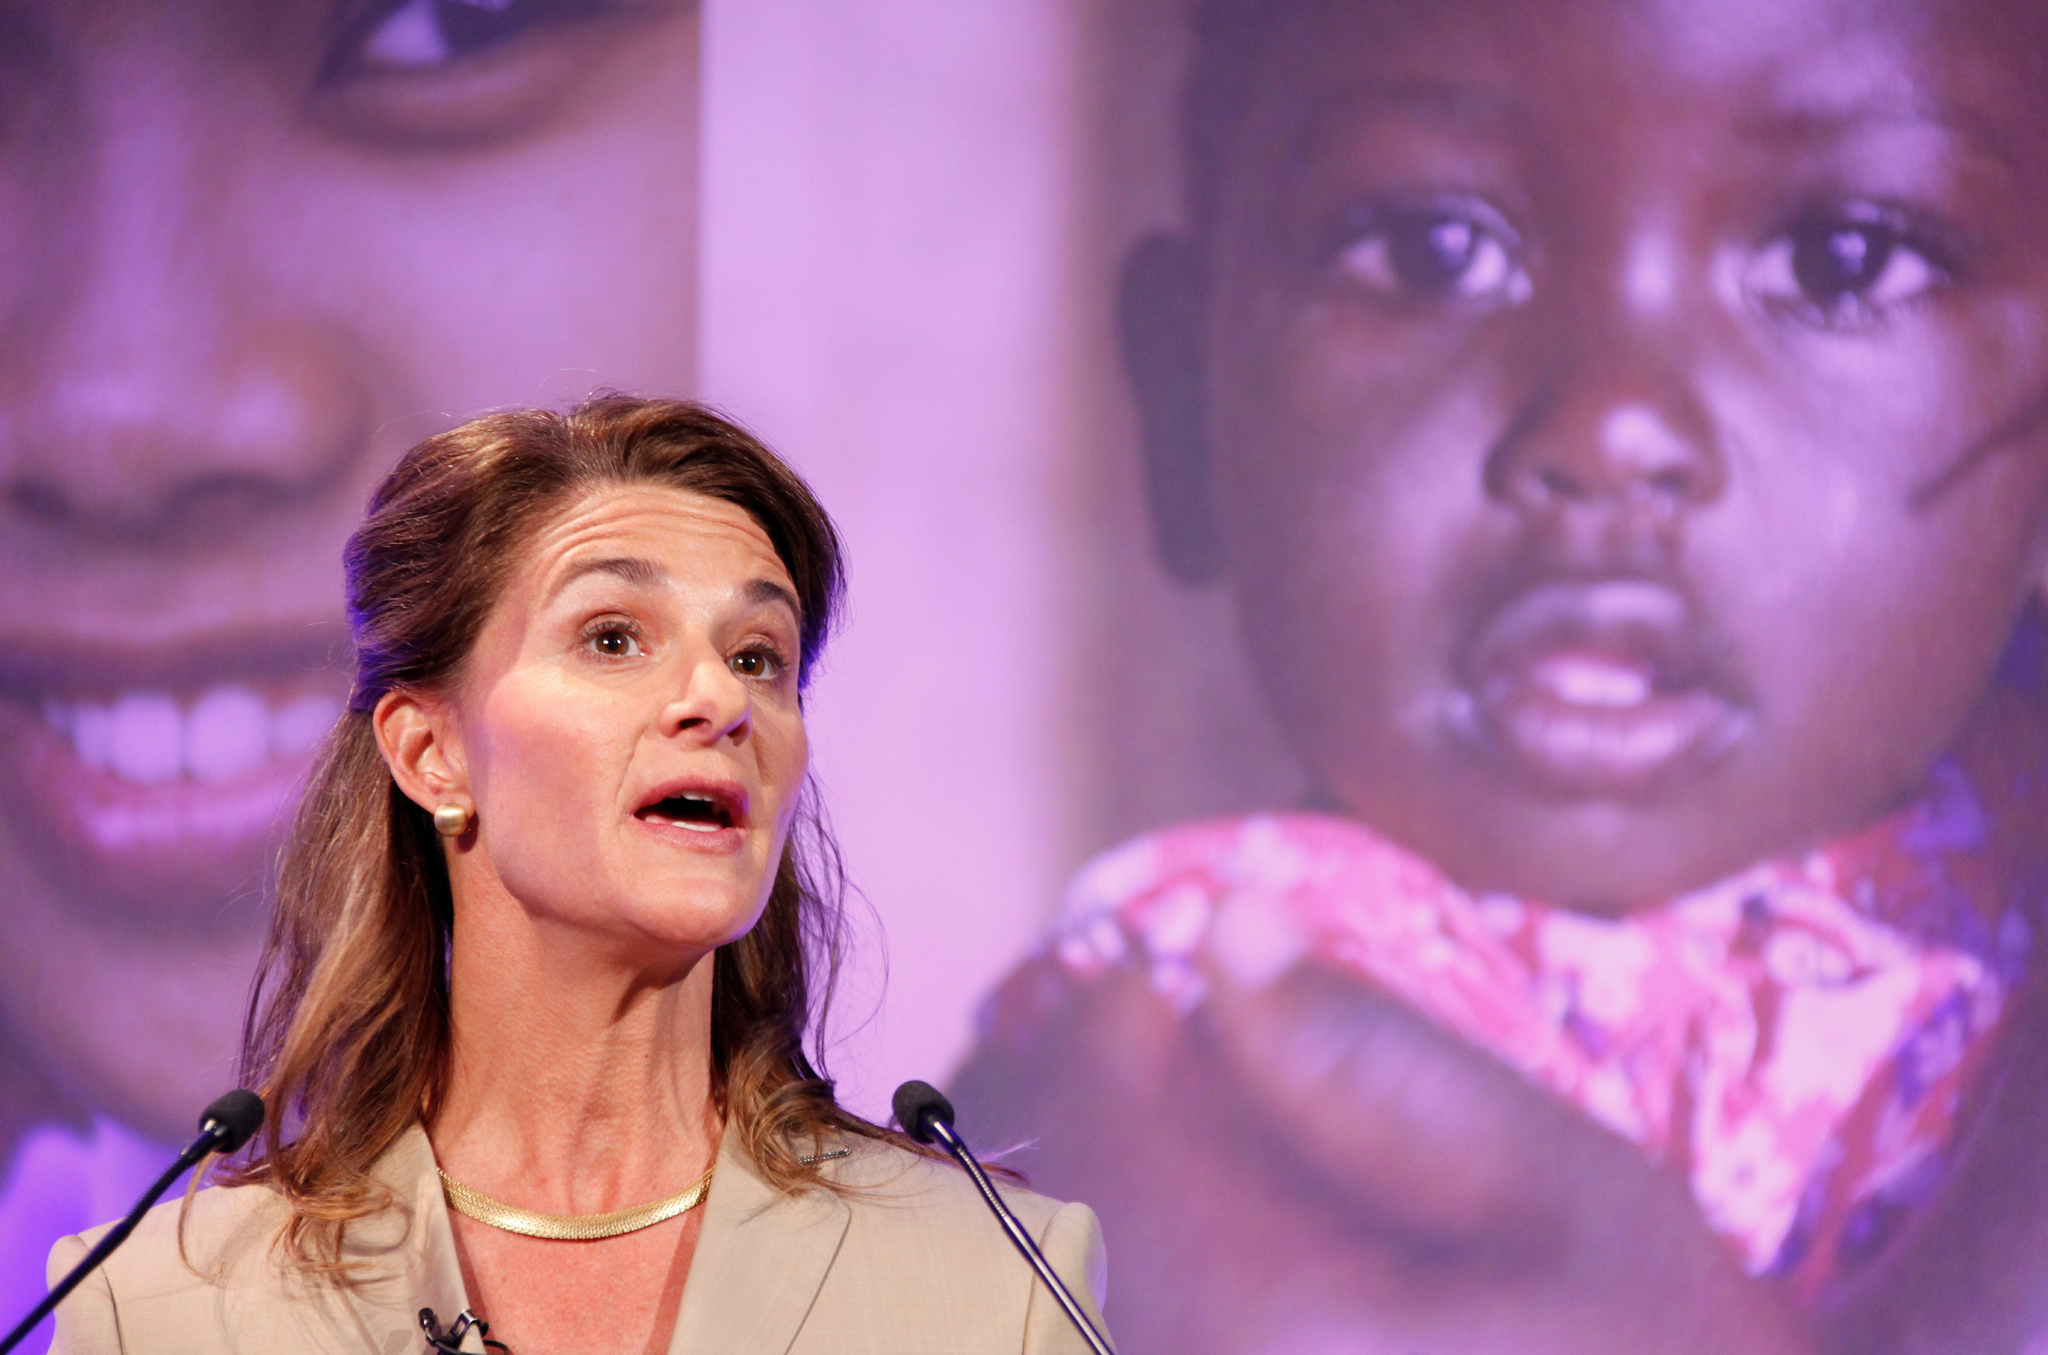 Image of Melinda Gates speaking at the London Summit on Family Planning